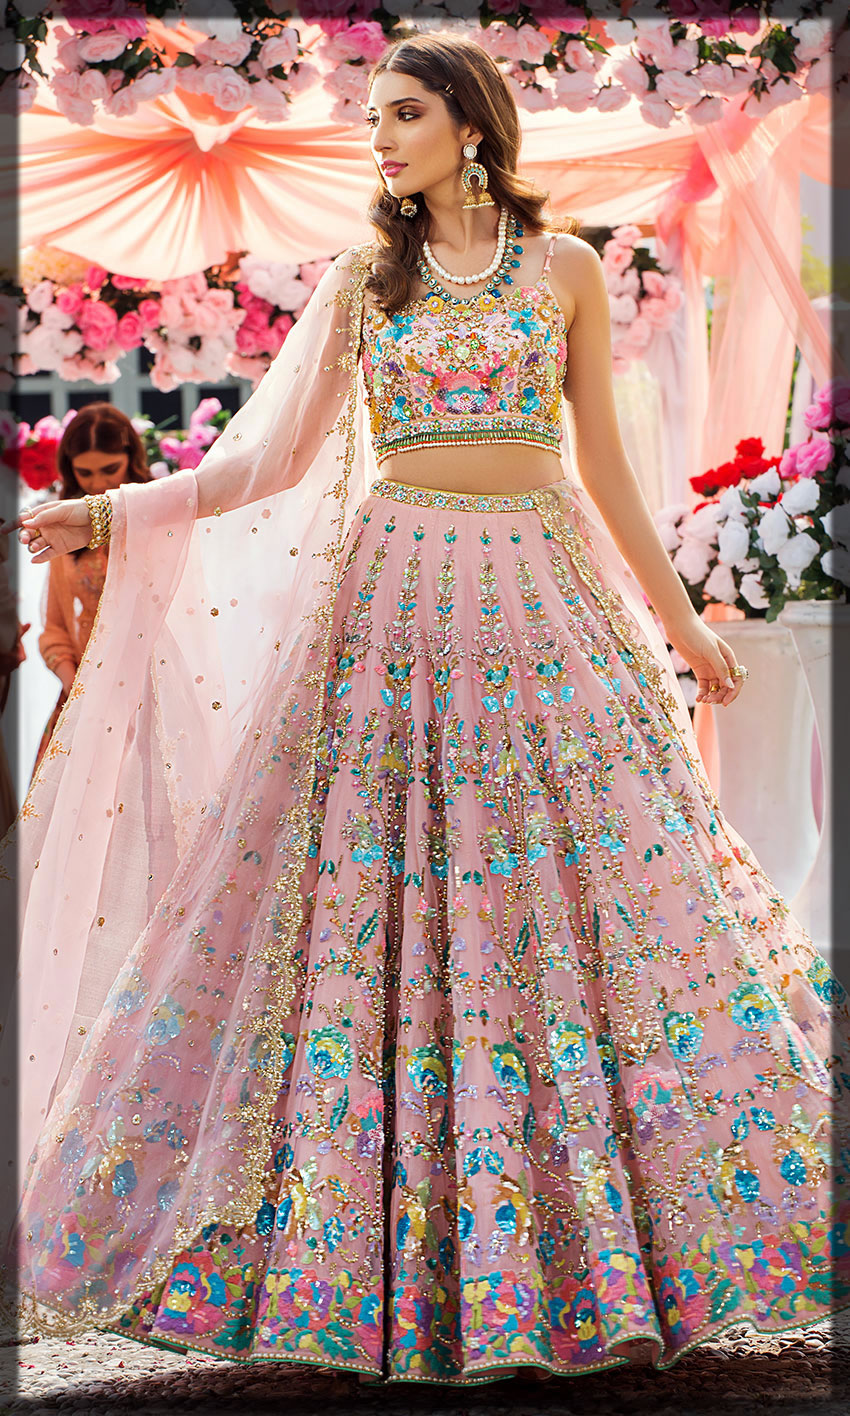 pink emboridery dress by nomi ansari